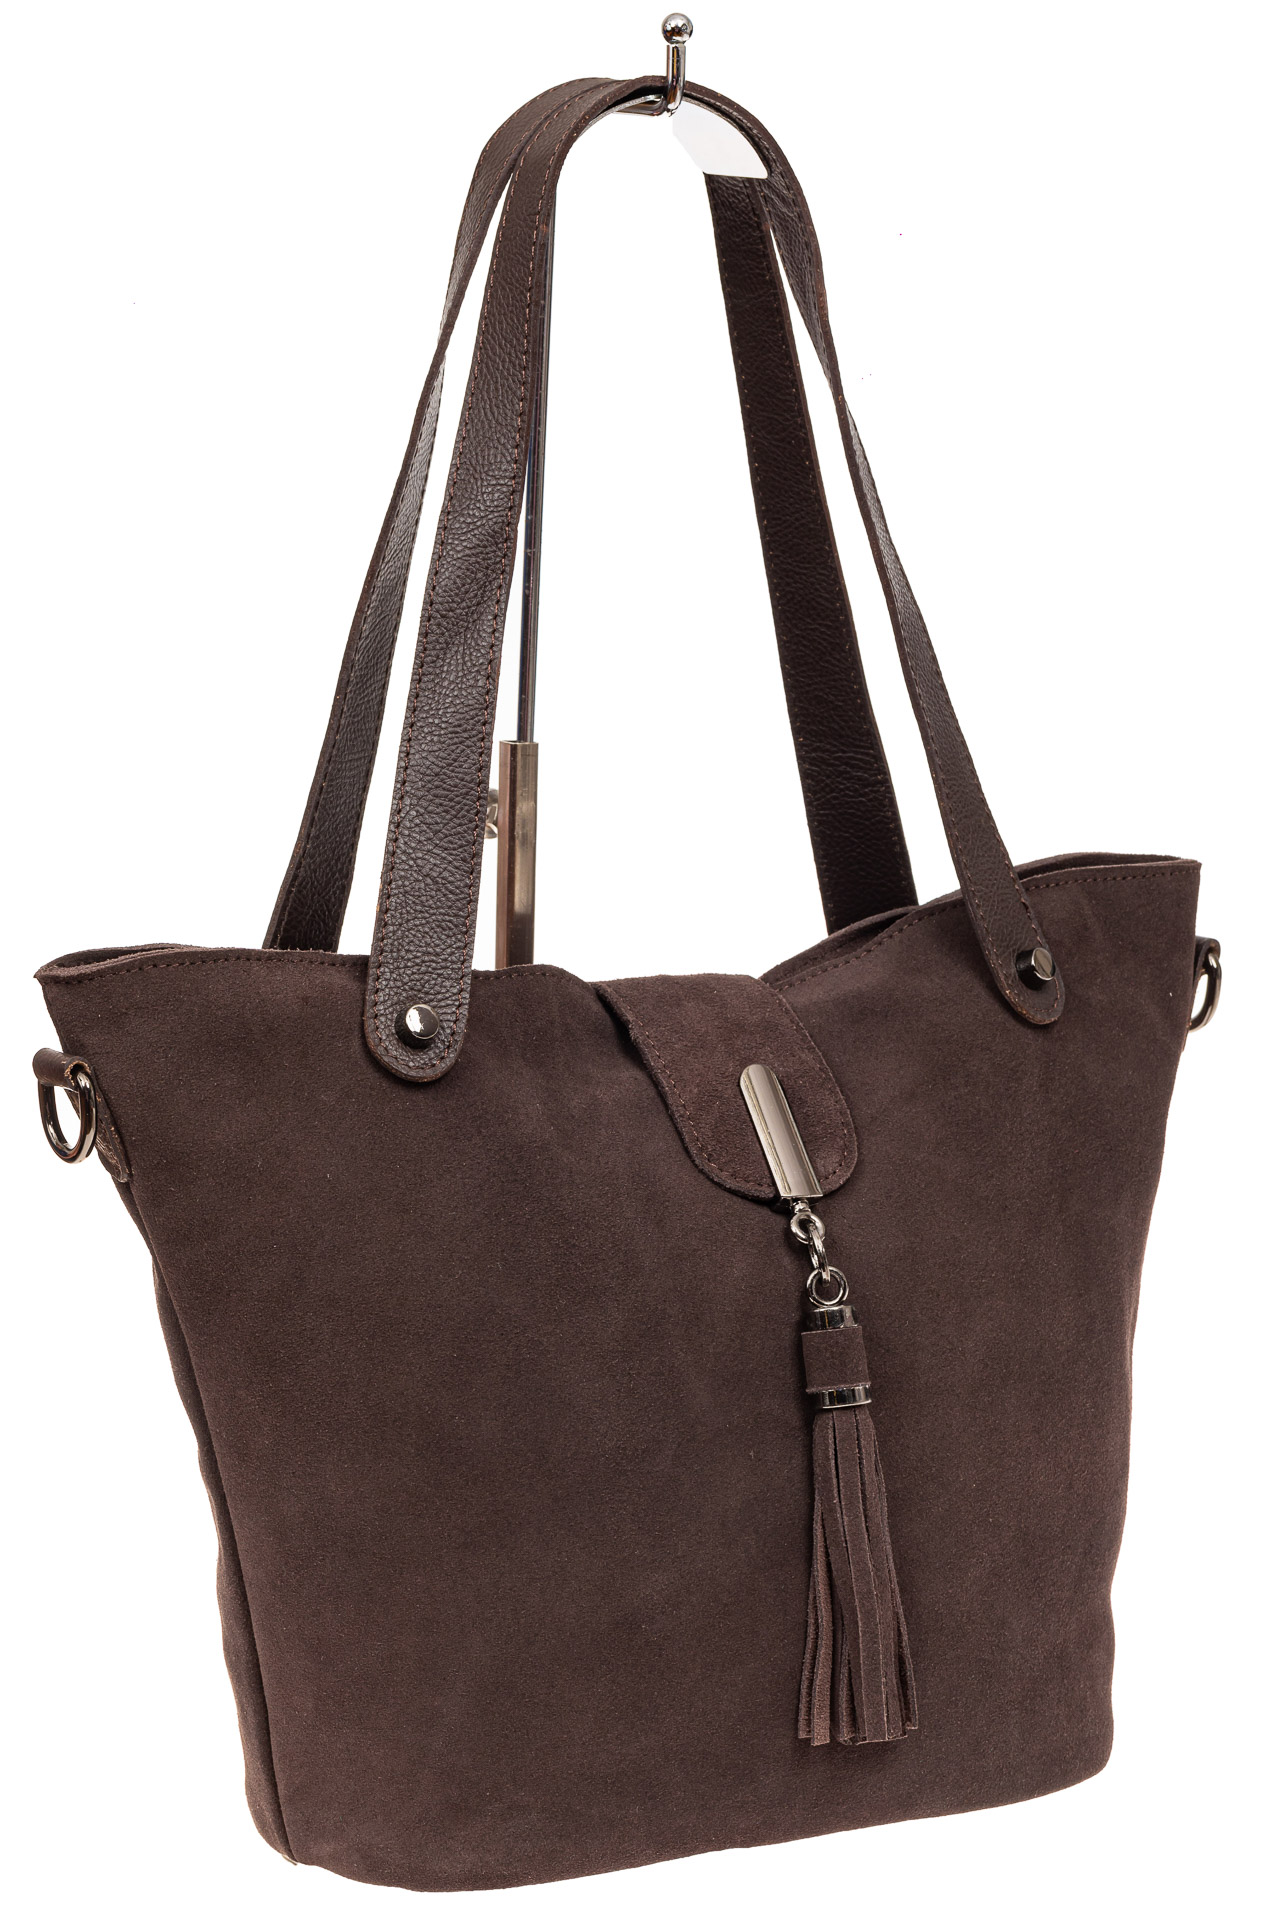 Замшевая сумка шоппер, цвет коричневыйA8006ZN8/8